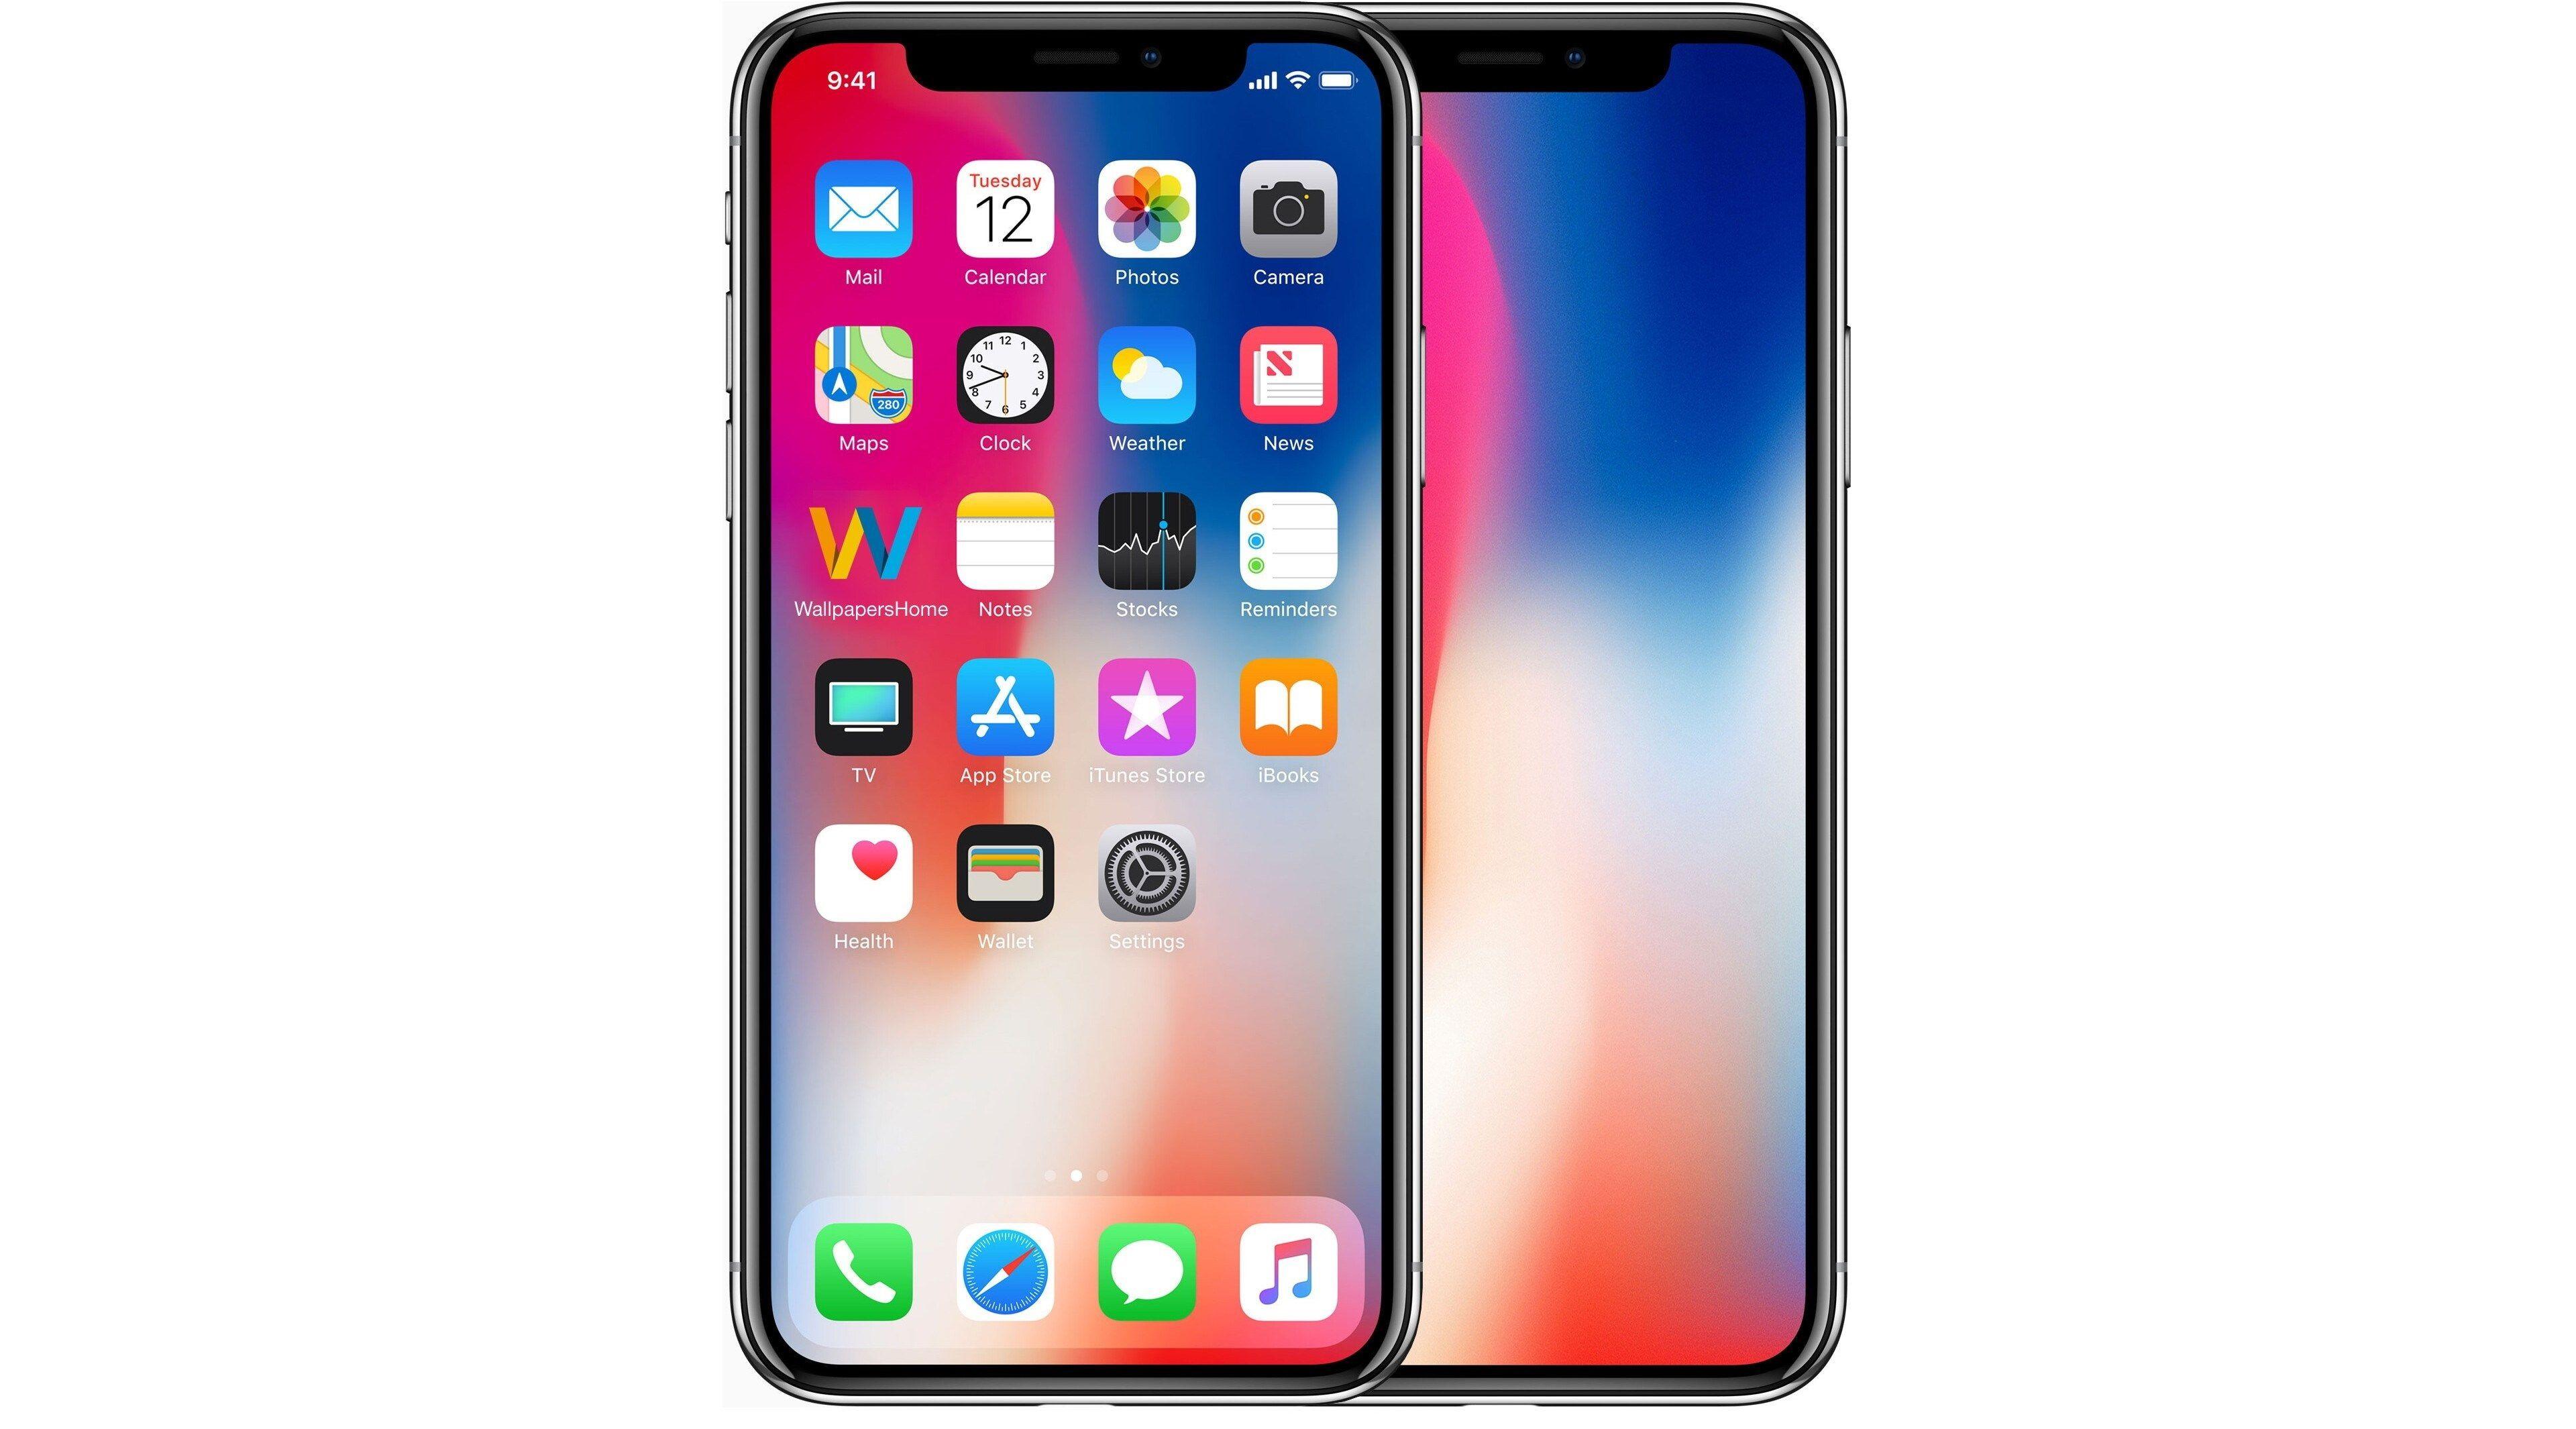 3840x2130 iphone x 4k wallpaper pack 1080p hd